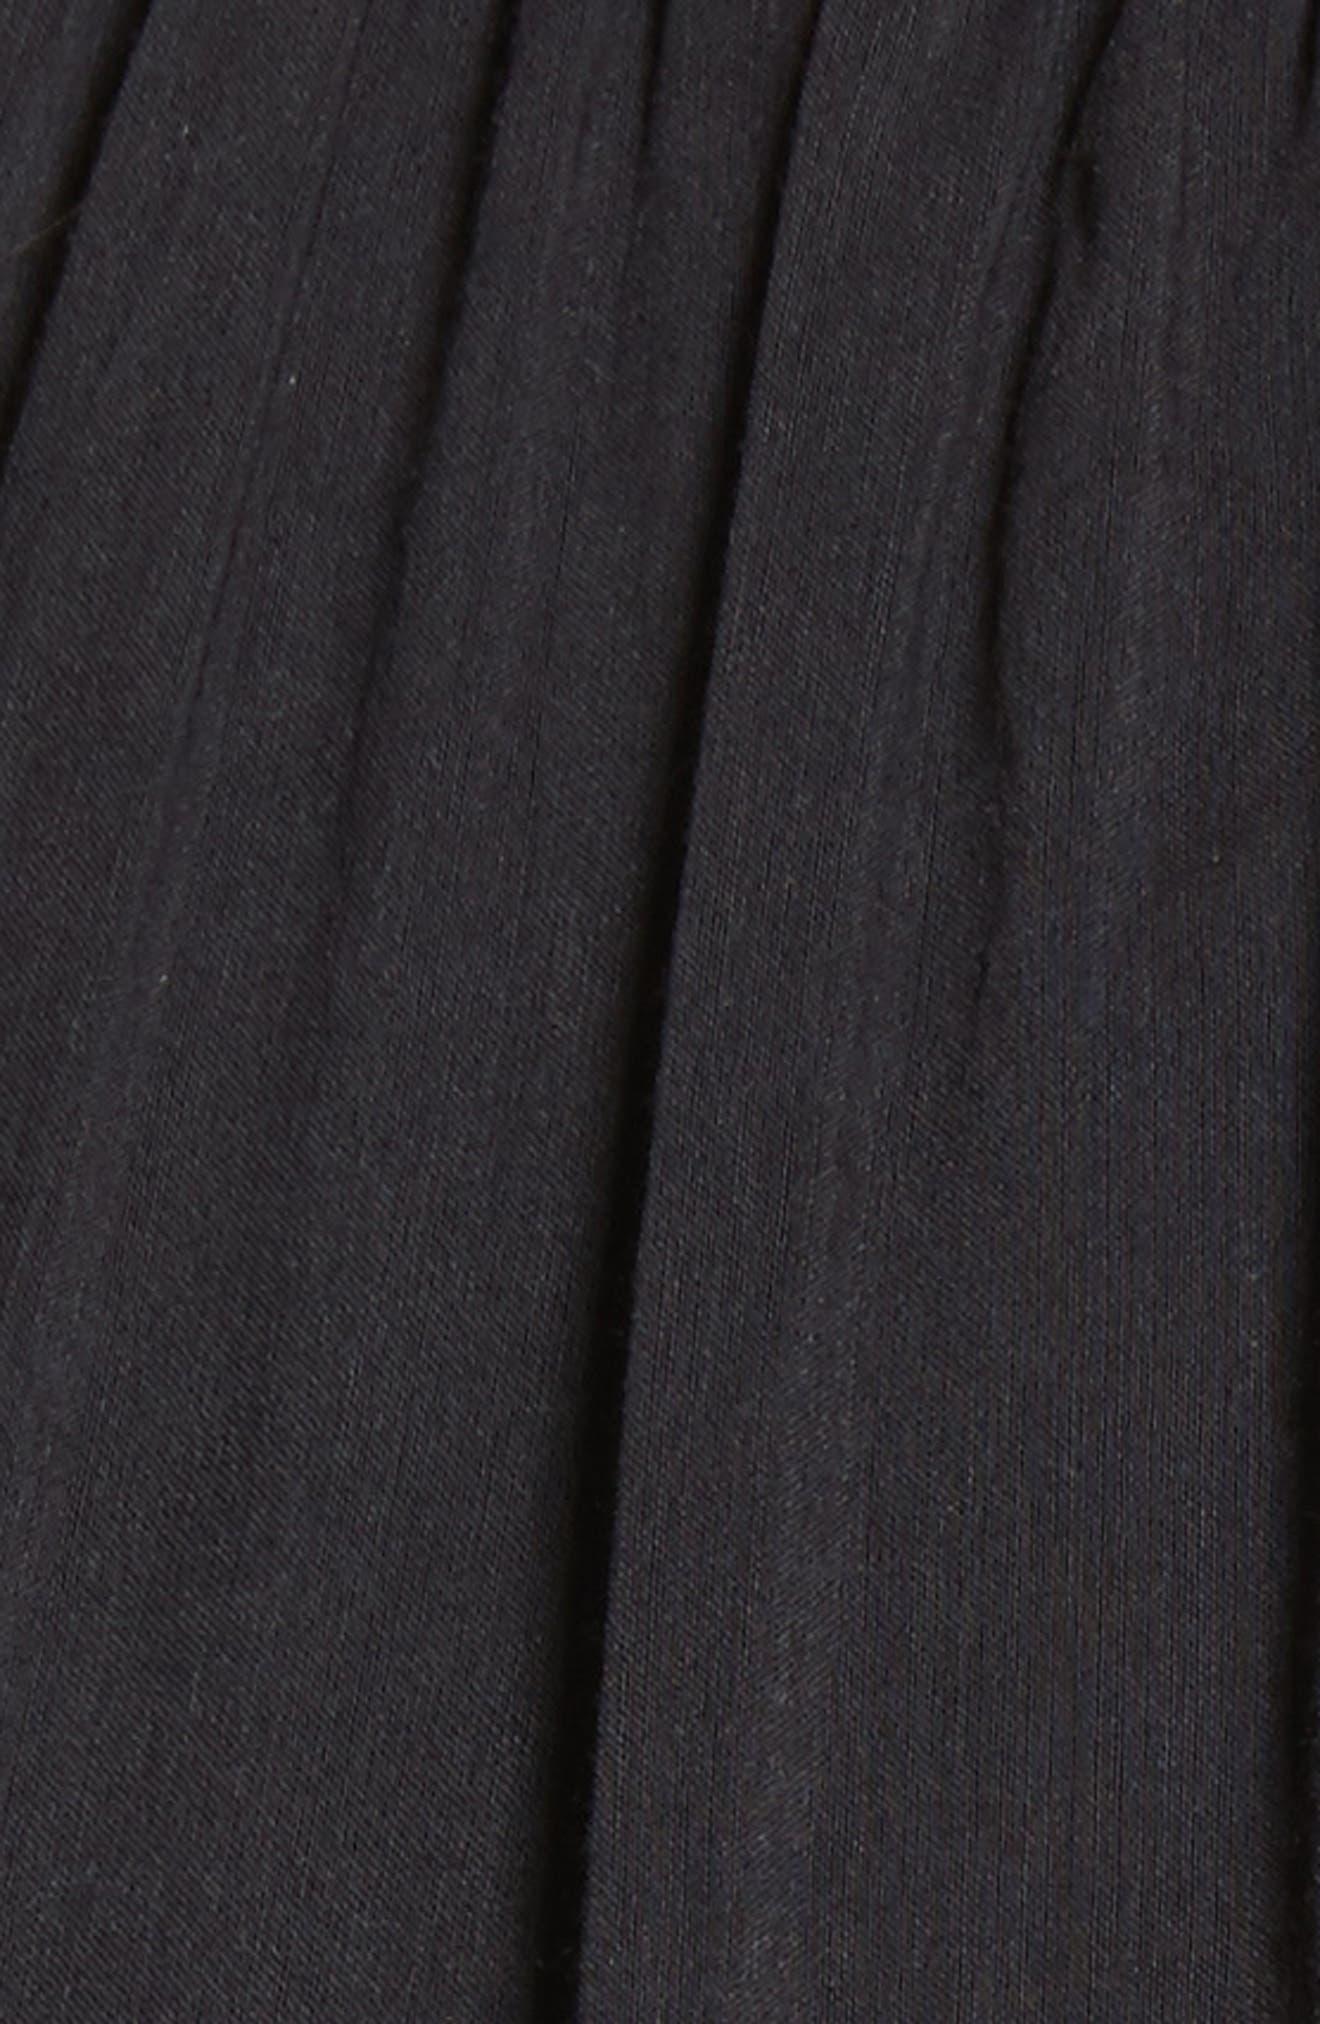 Danit Embroidered Stripe Cotton & Silk Dress,                             Alternate thumbnail 5, color,                             001